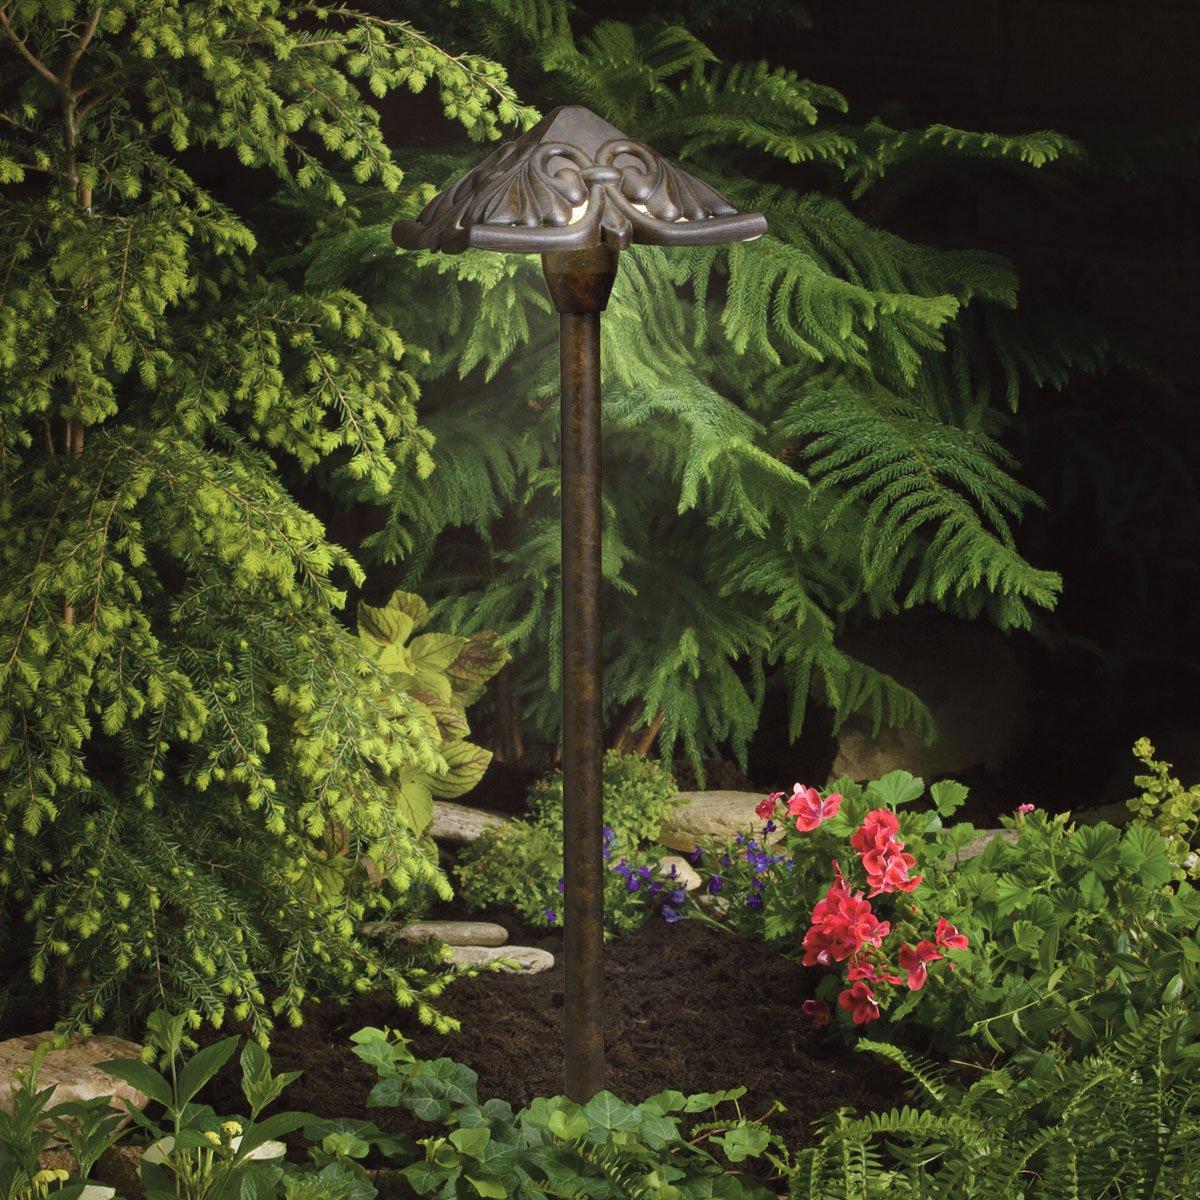 Kichler 15437TZT Path & Spread 1-Light 12V, Textured Tannery Bronze